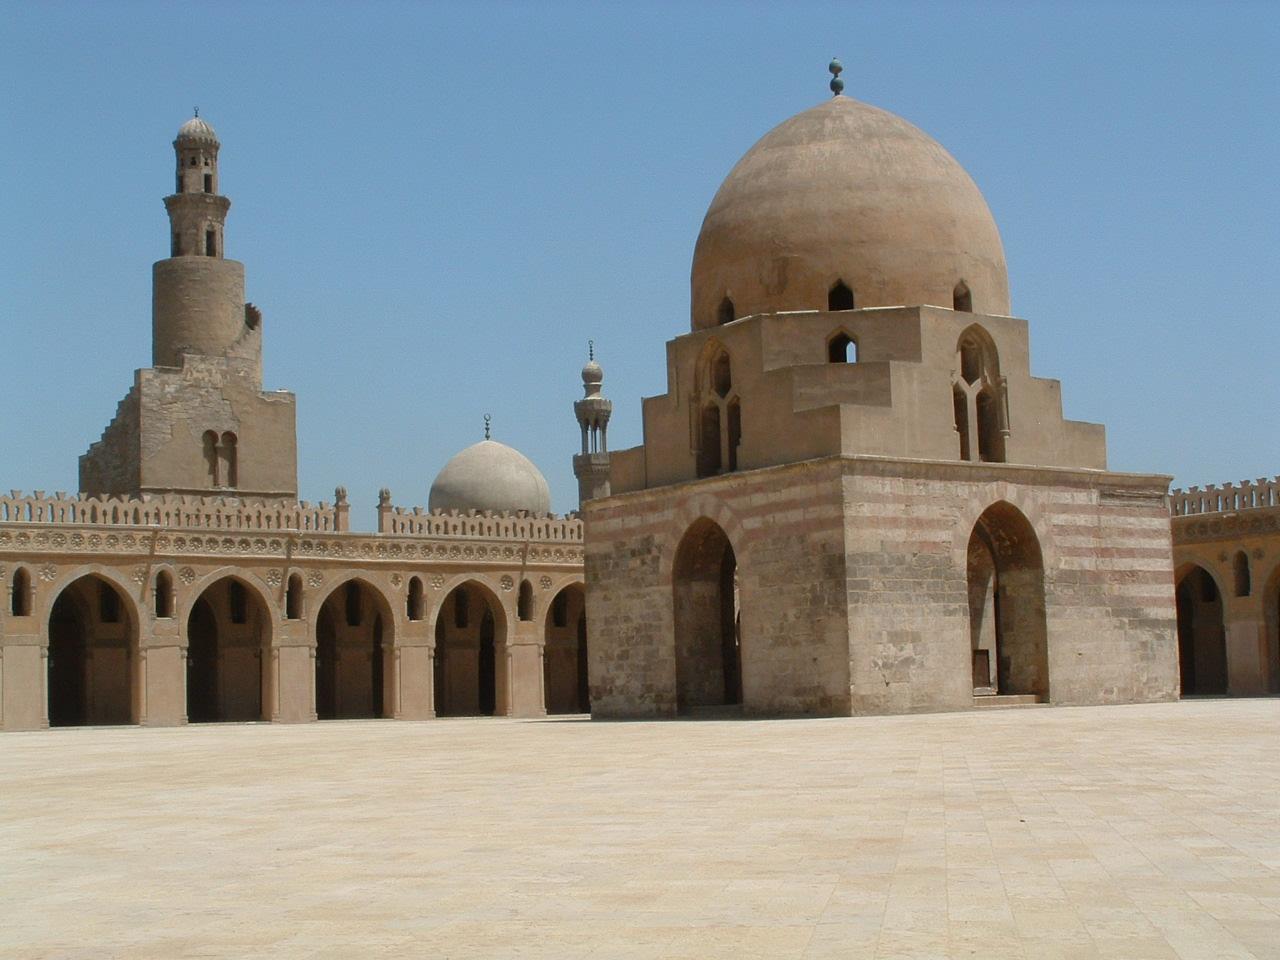 Middle Eastern buildings